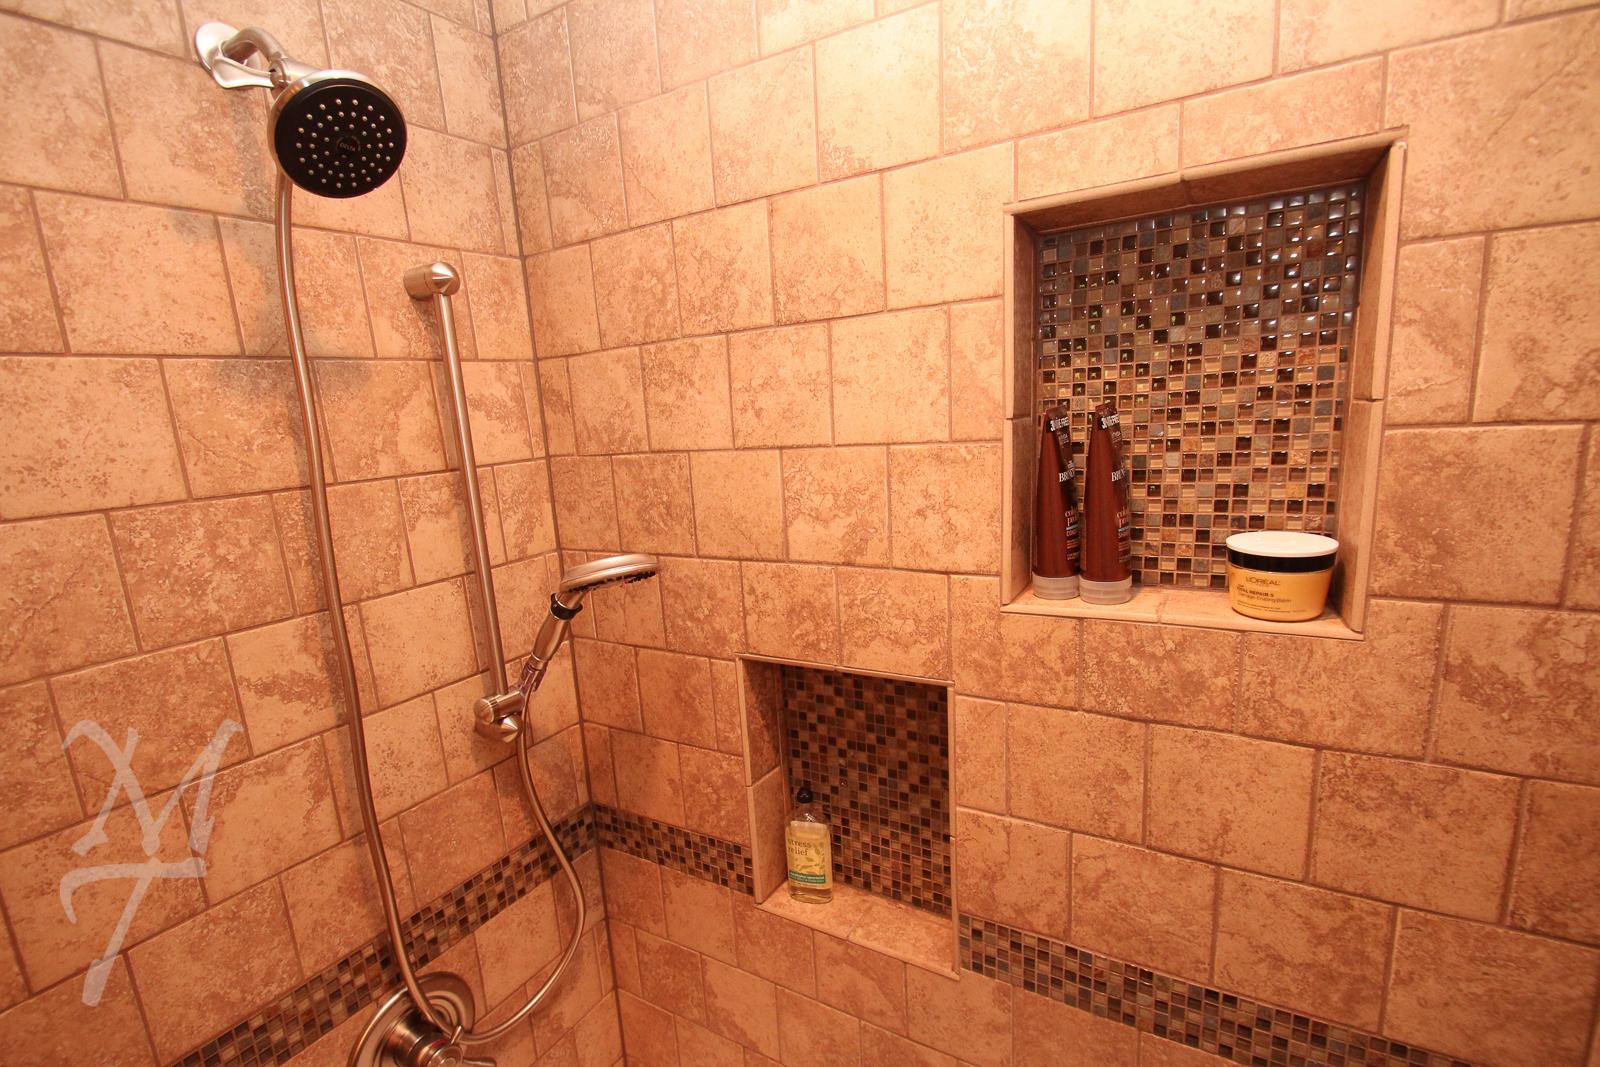 After_Bathroom_Misc_01D.jpg